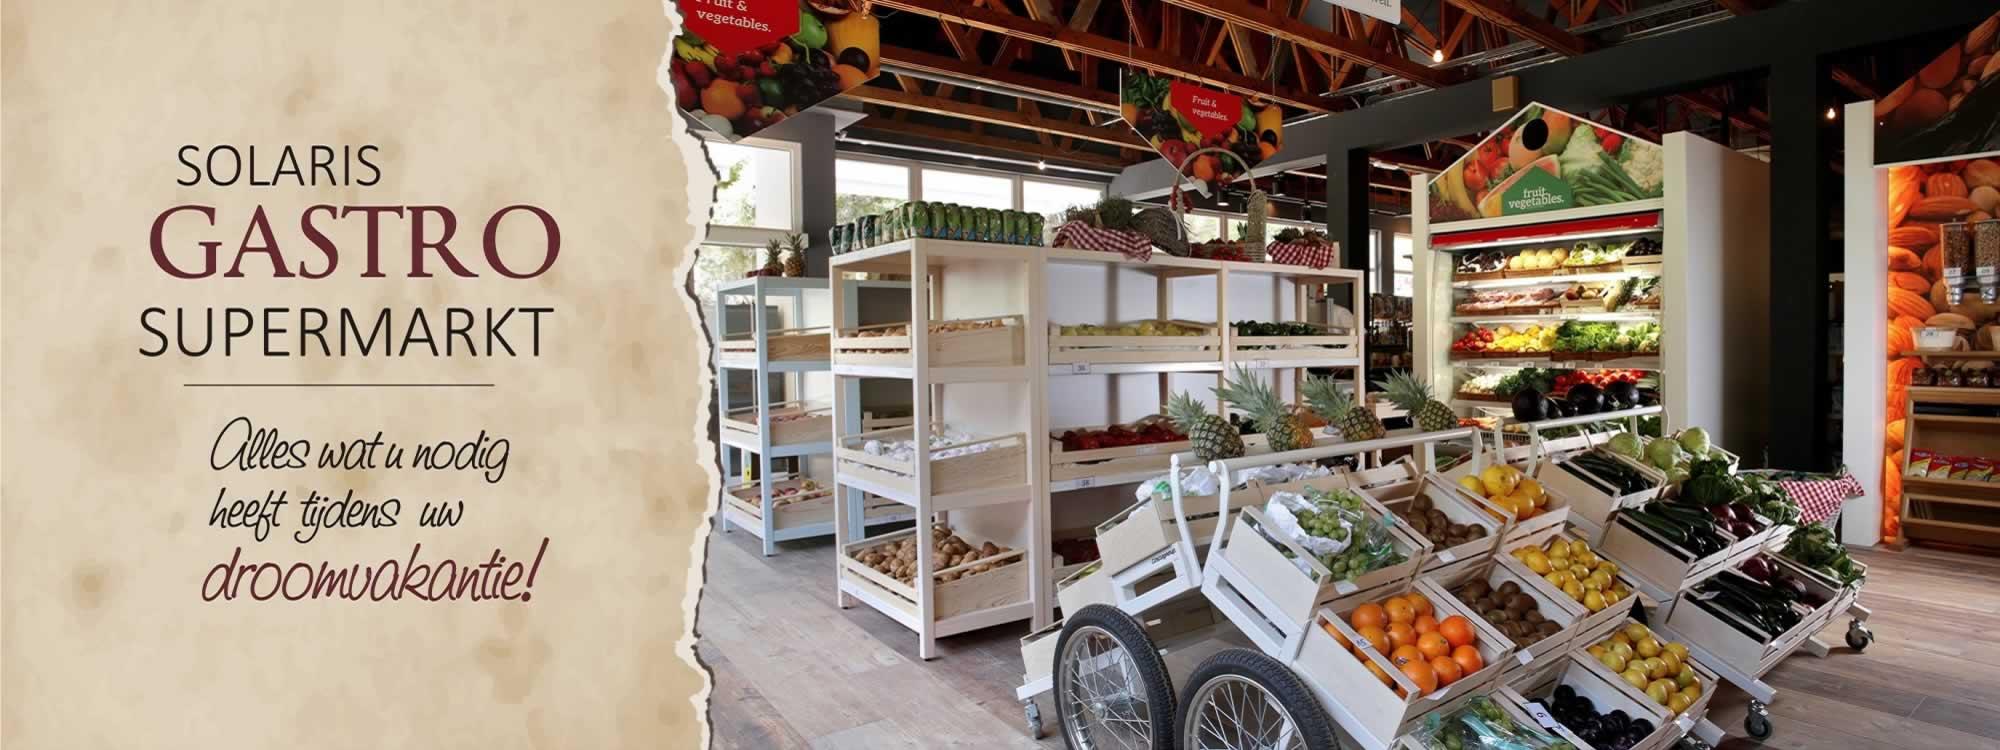 Solaris_shopping_gastro_supermarkt_camping_kroatie_drromvakantieNL